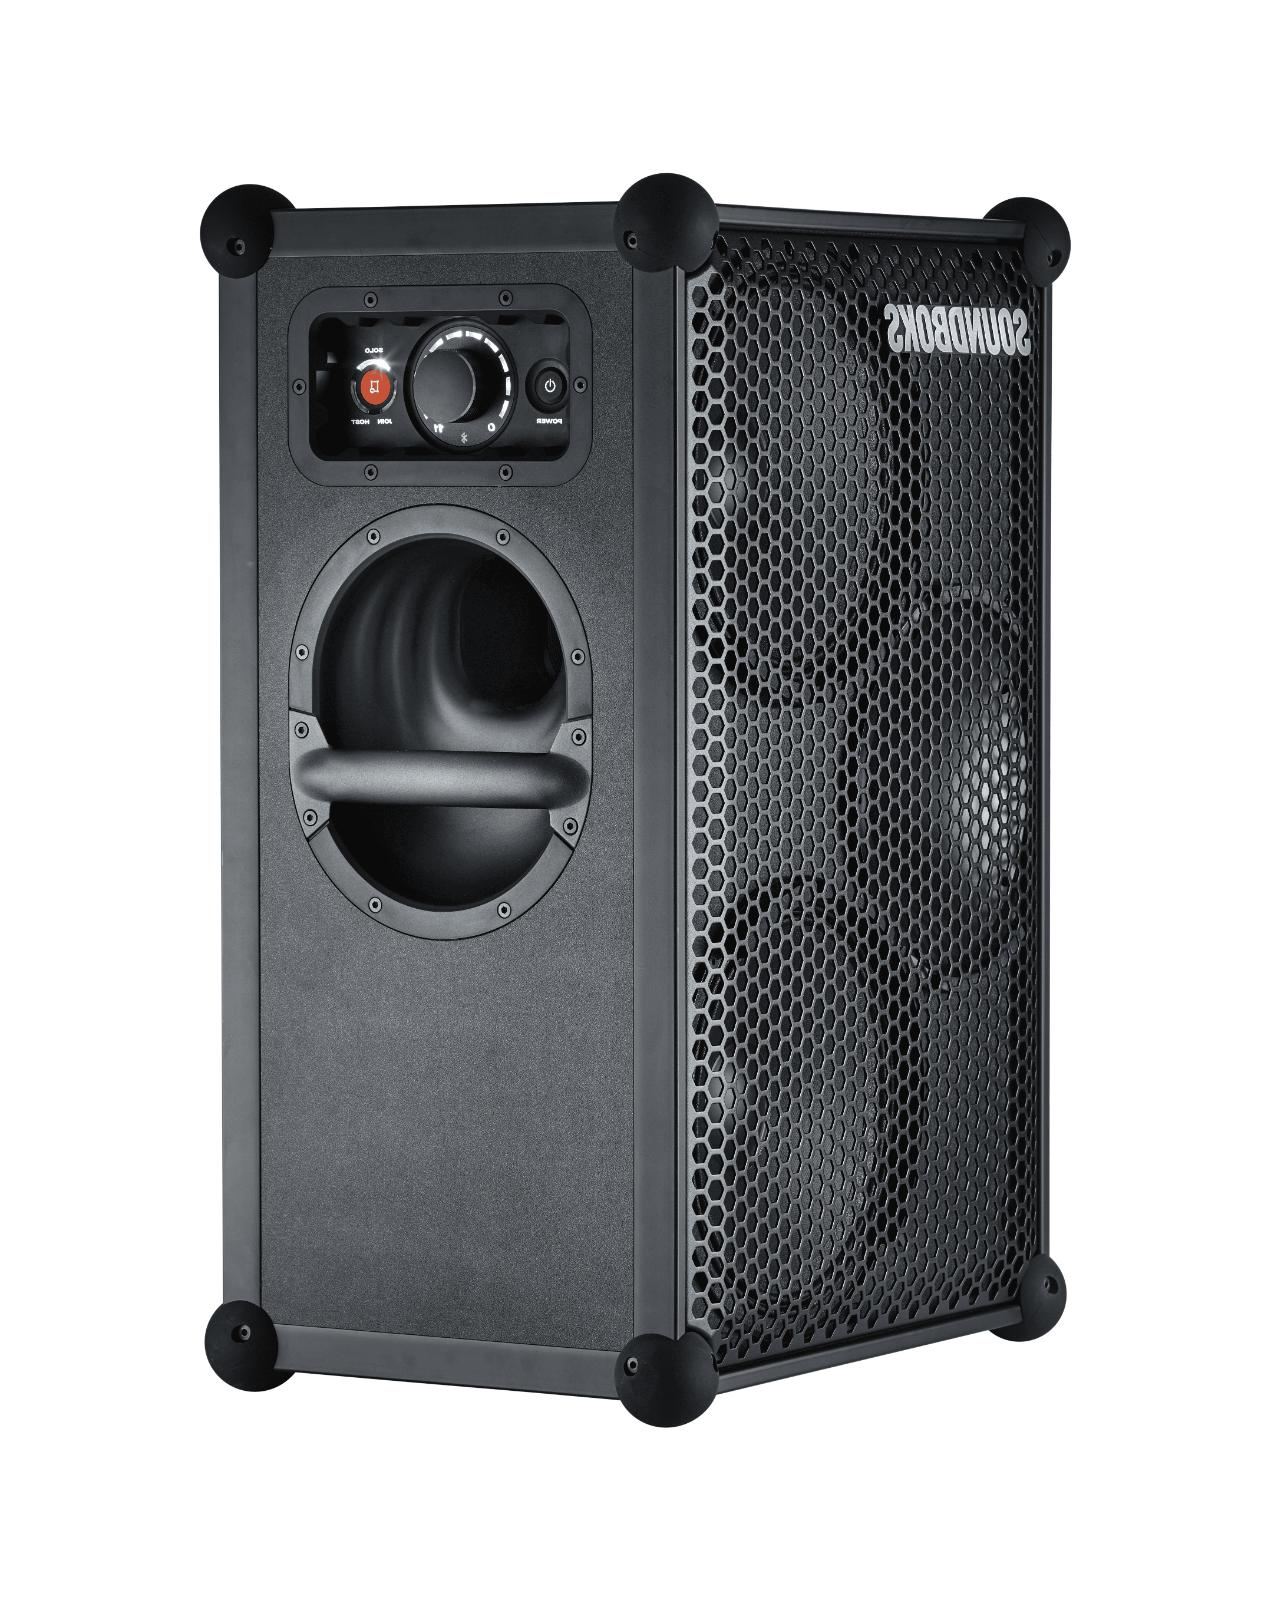 The SOUNDBOKS - The Loudest Portable Performance Speaker